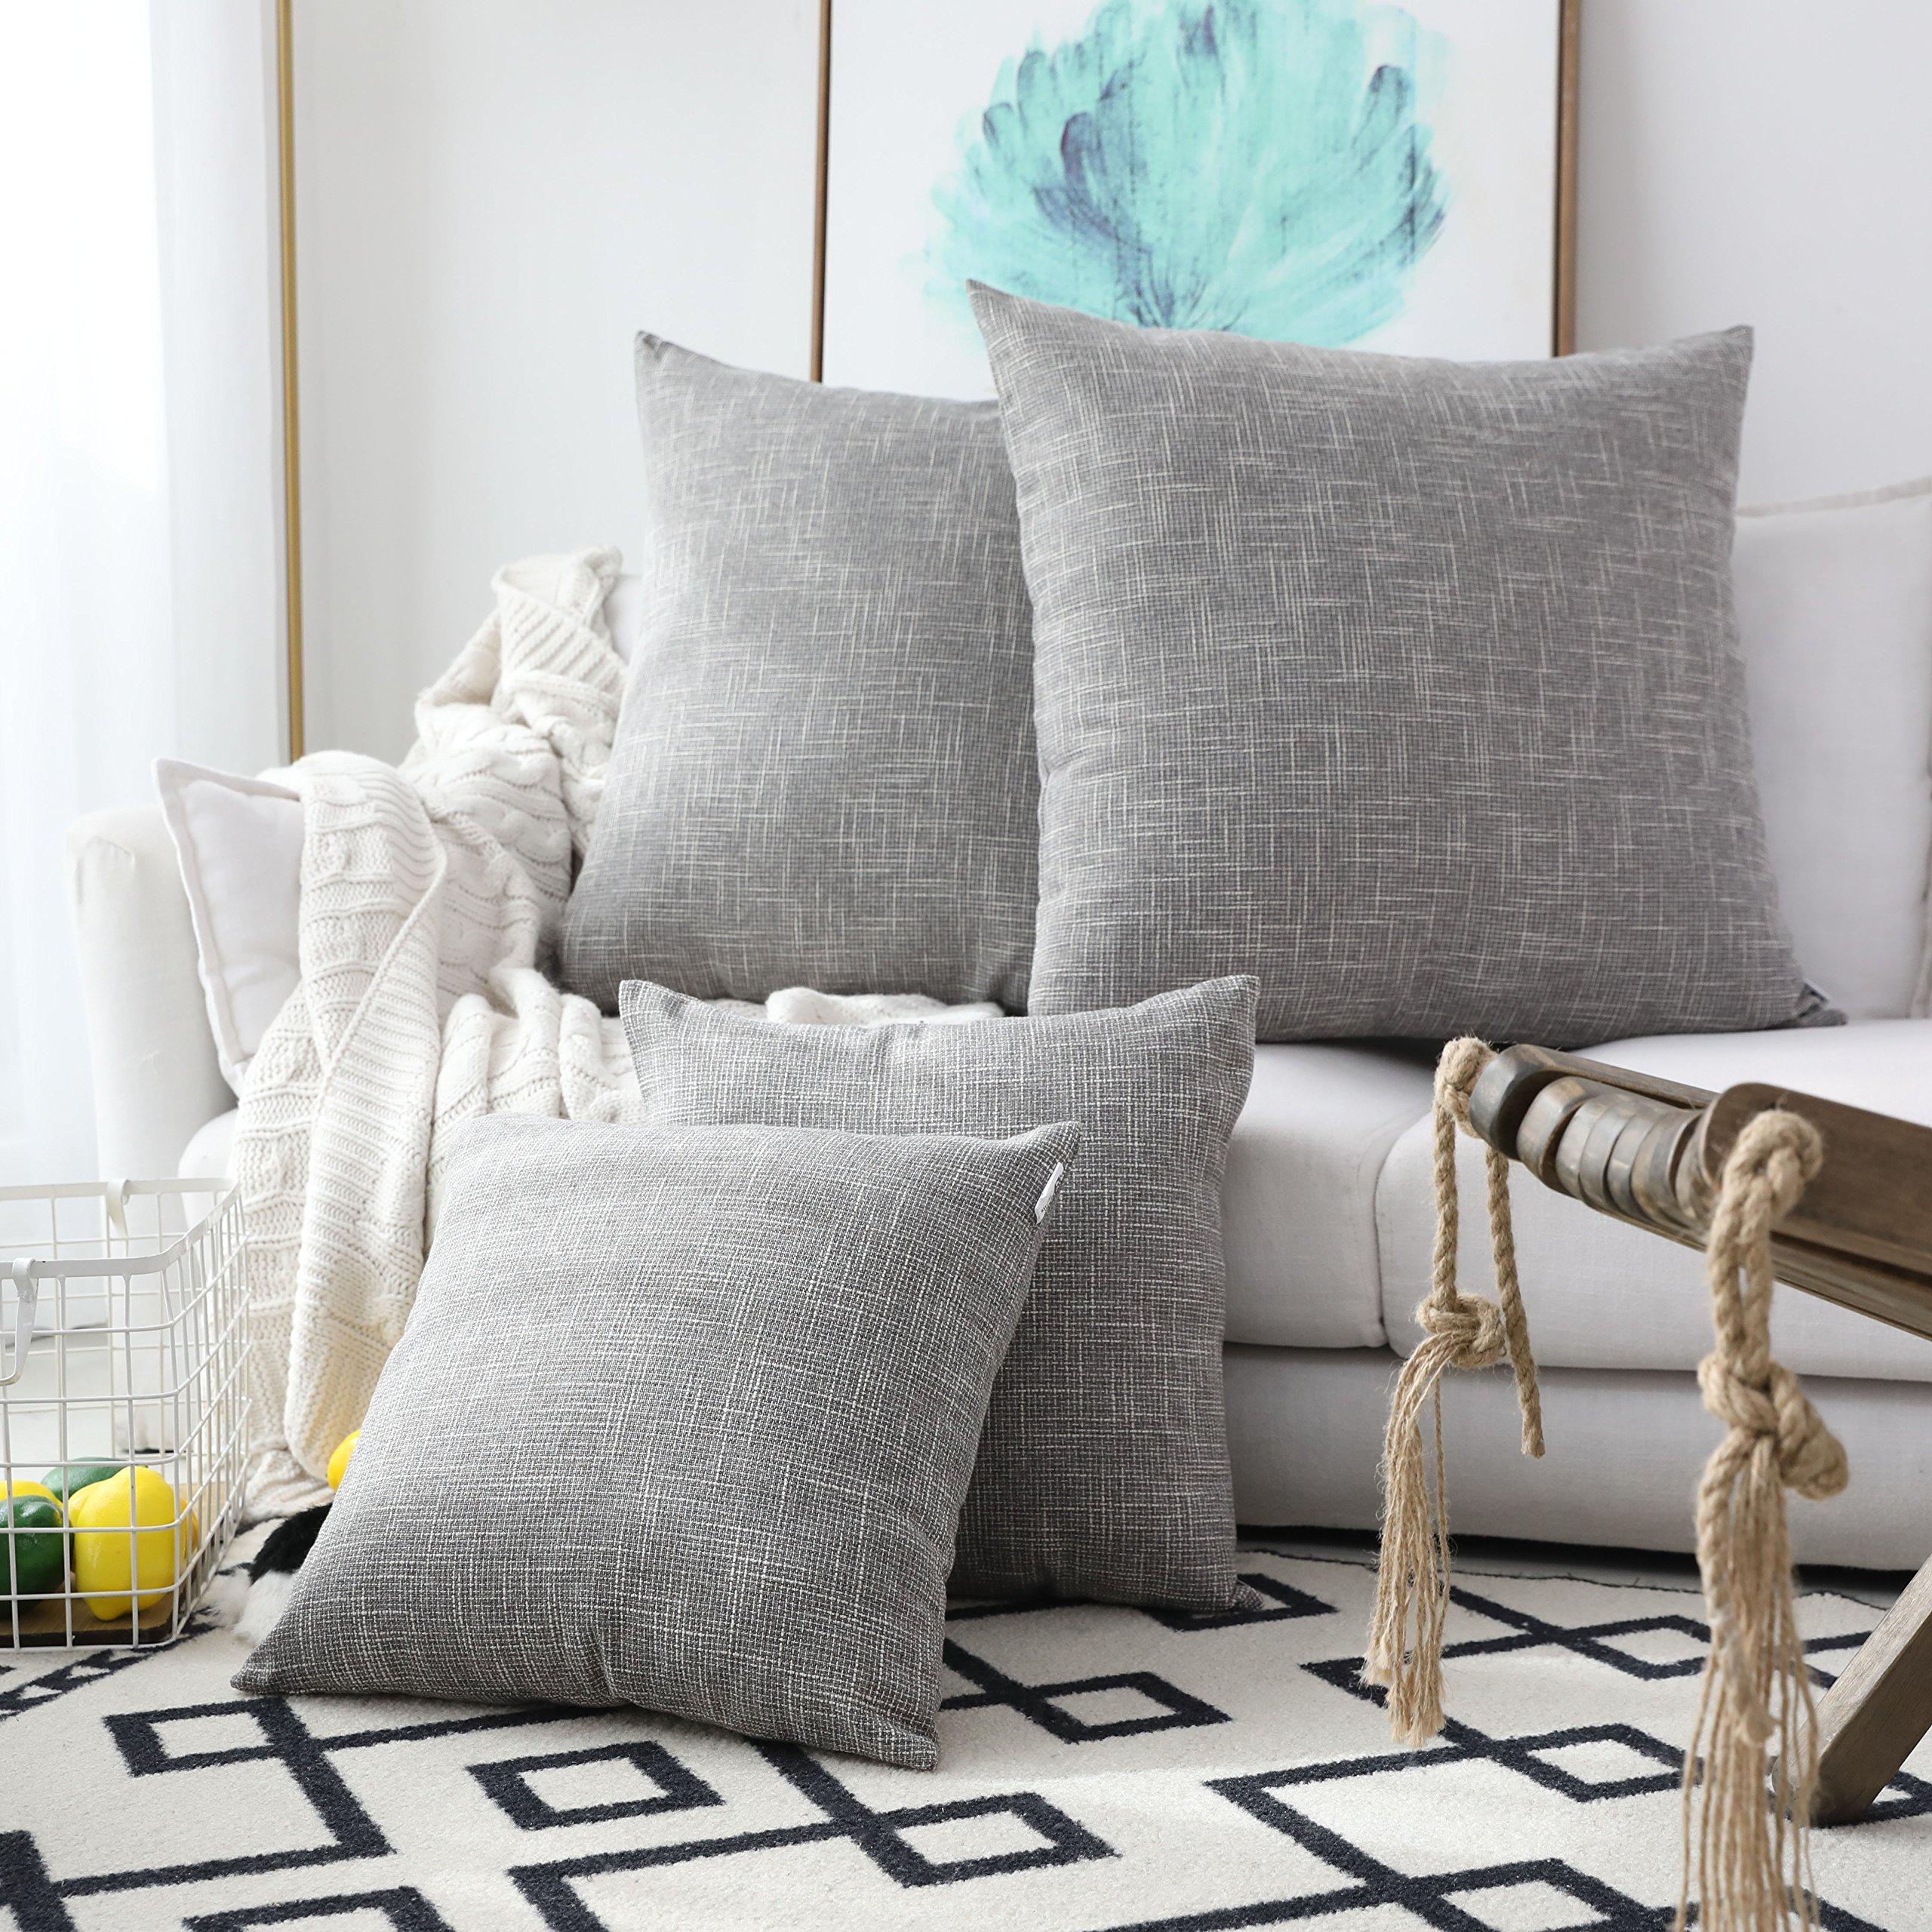 large sofa pillows 24x24 18 14 hus noorderpad de u2022 rh 18 14 hus noorderpad de